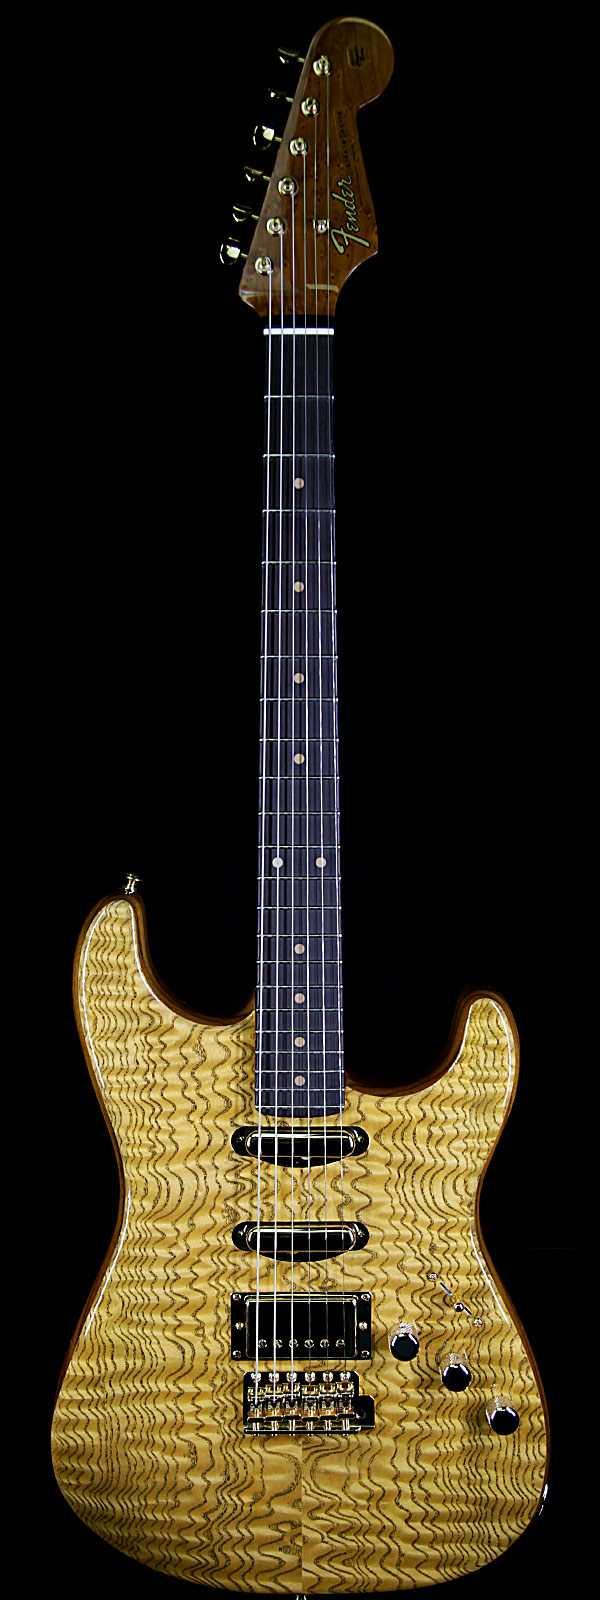 Fender Custom Shop Paul Waller Masterbuilt Artisan Stratocaster HSS Tamo Ash Top African Blackwood Board